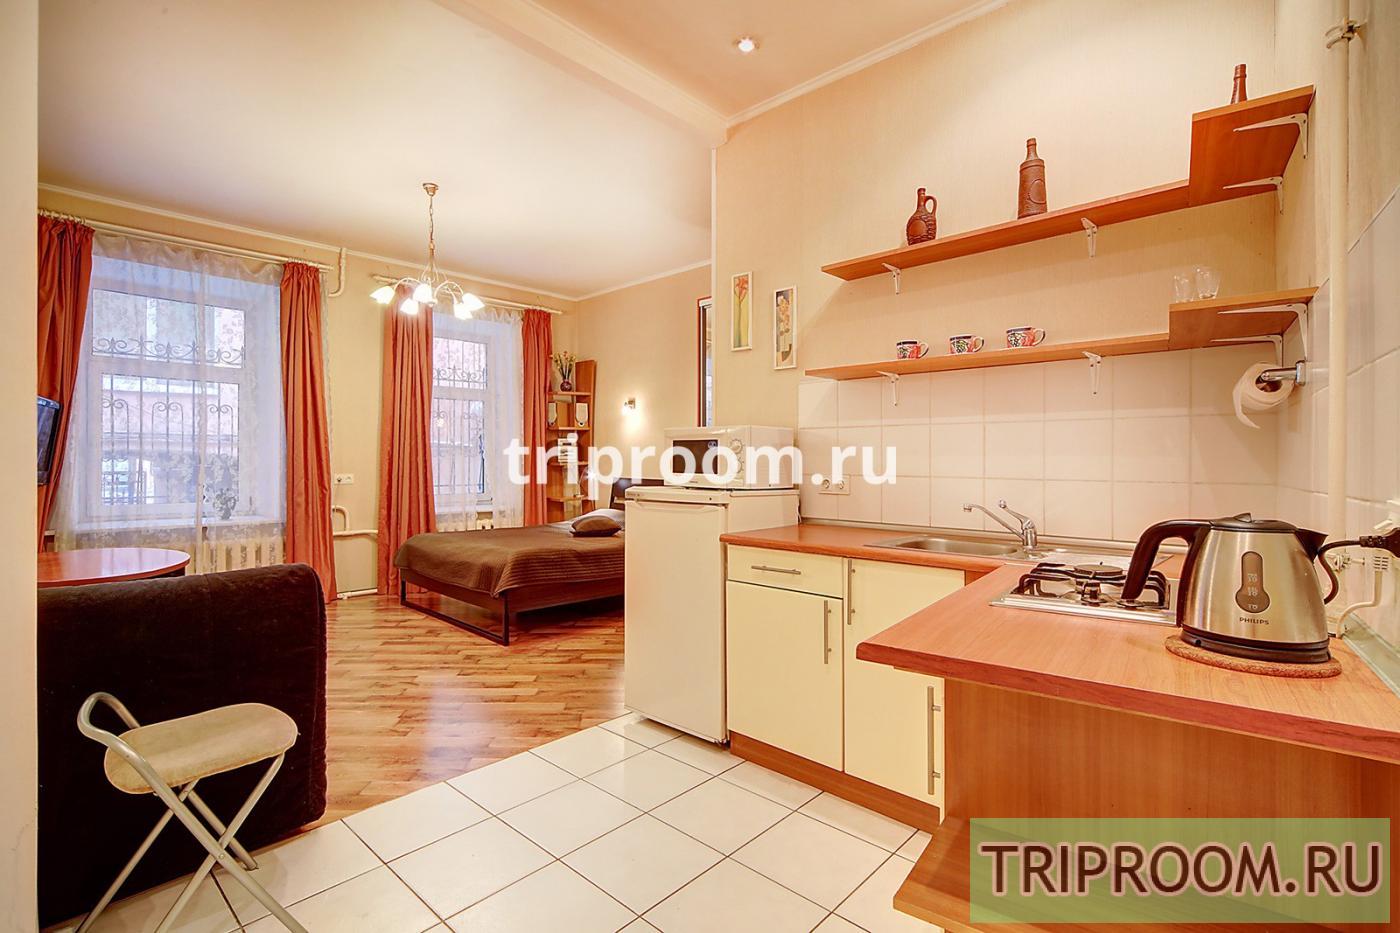 1-комнатная квартира посуточно (вариант № 15082), ул. Невский проспект, фото № 6